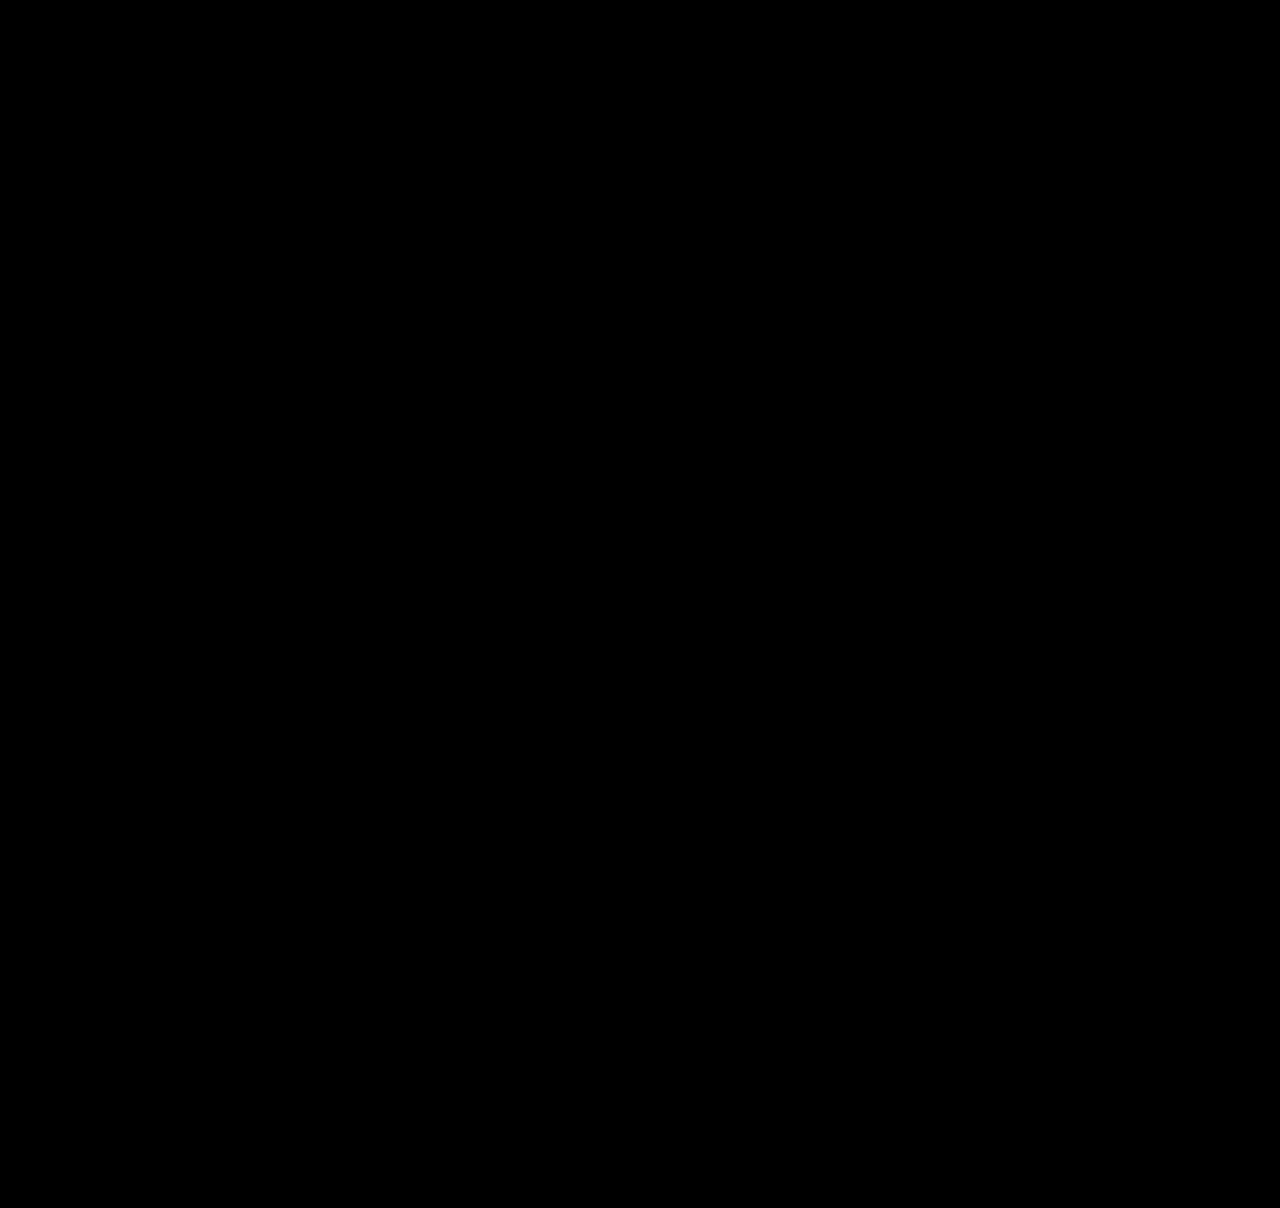 silhouette-3265766_1280